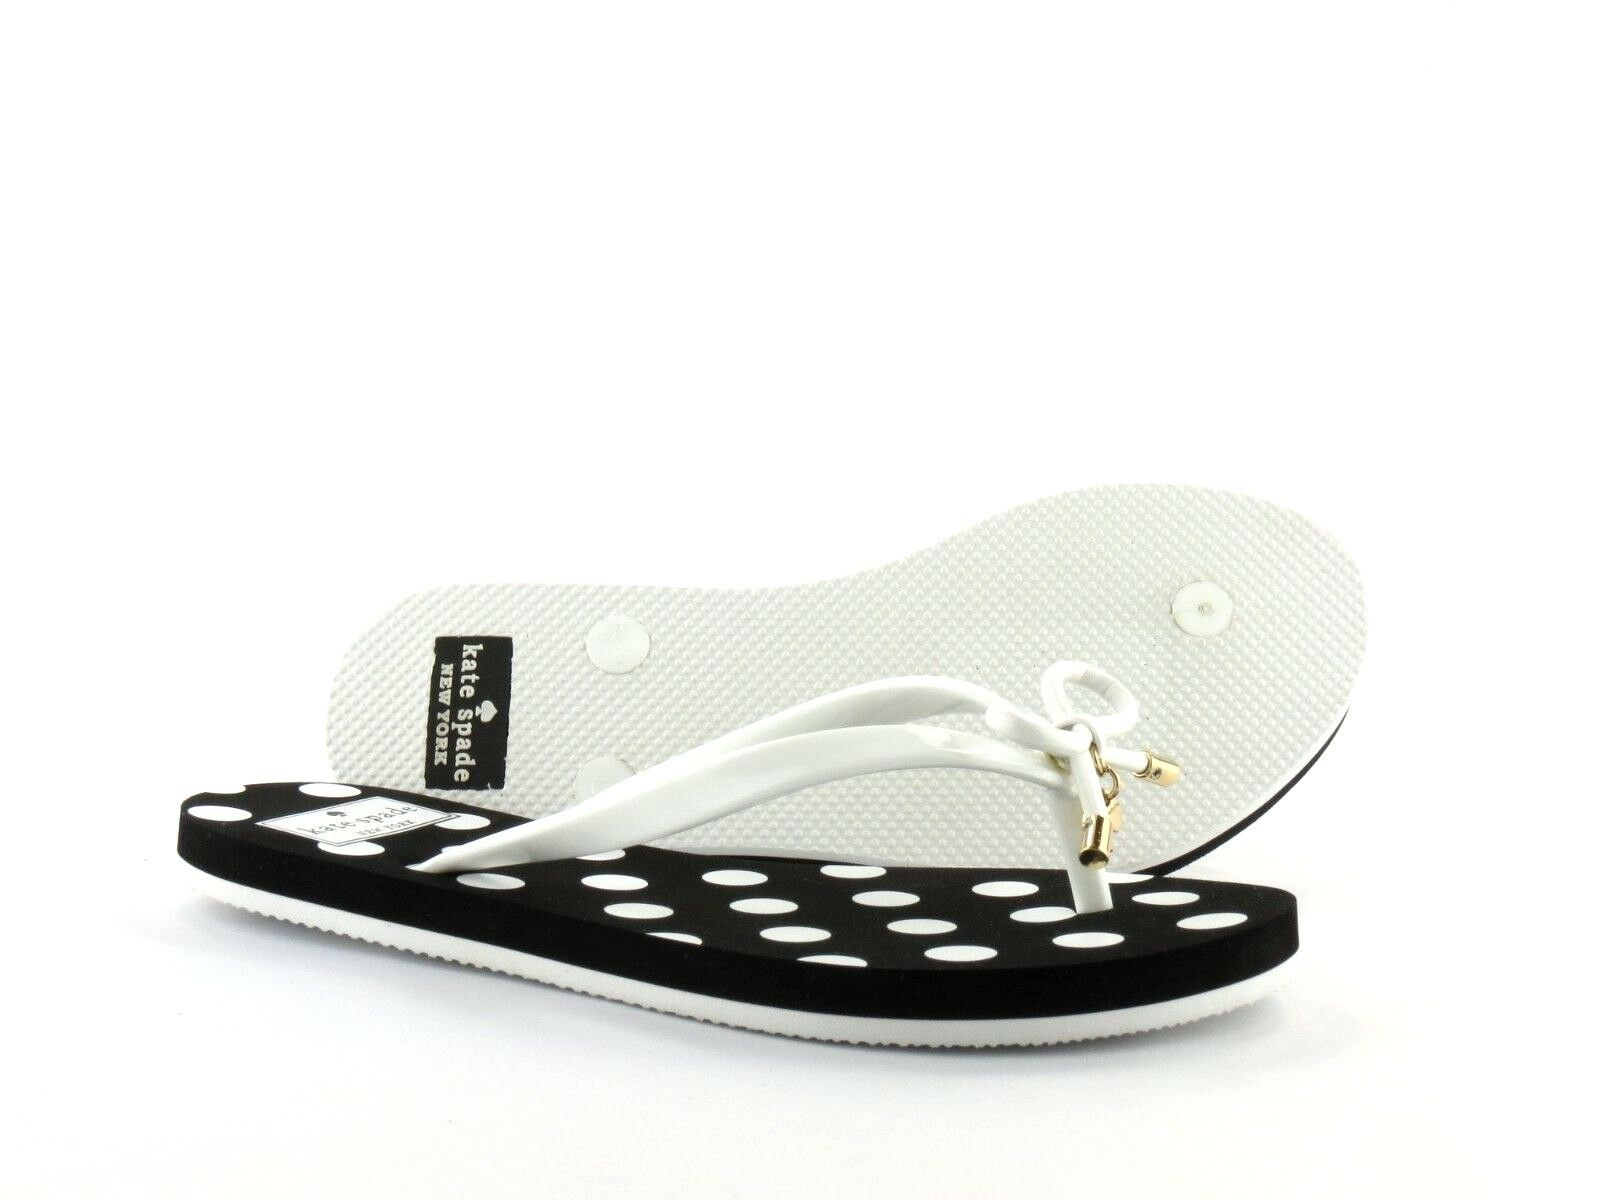 f7fb589622ba Kate Spade S080014 Nova White Shiny Rubber Polka Dot Black Flip Flop Sandal  5 for sale online